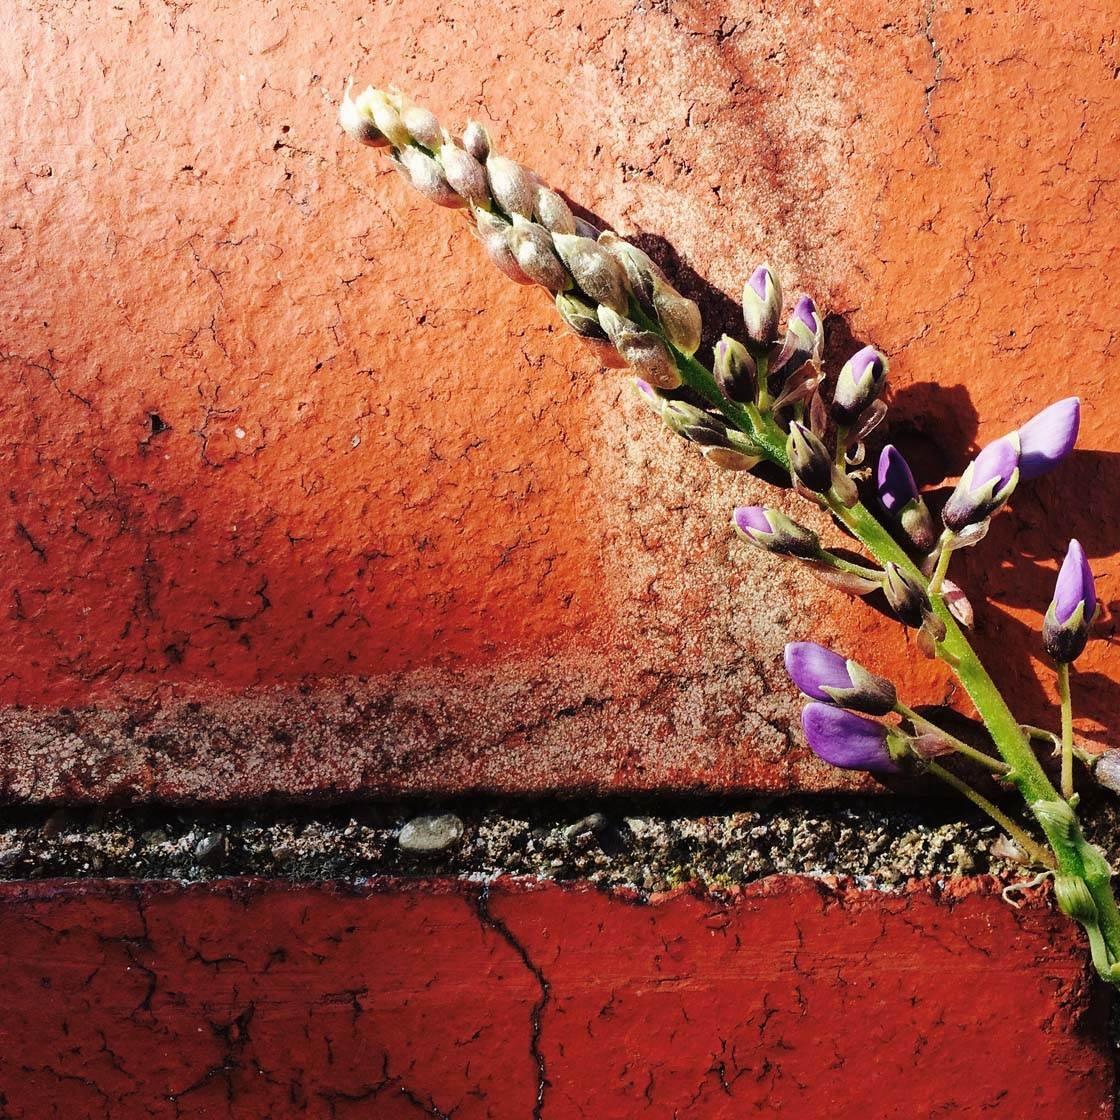 iPhone Flower Photography 27 no script